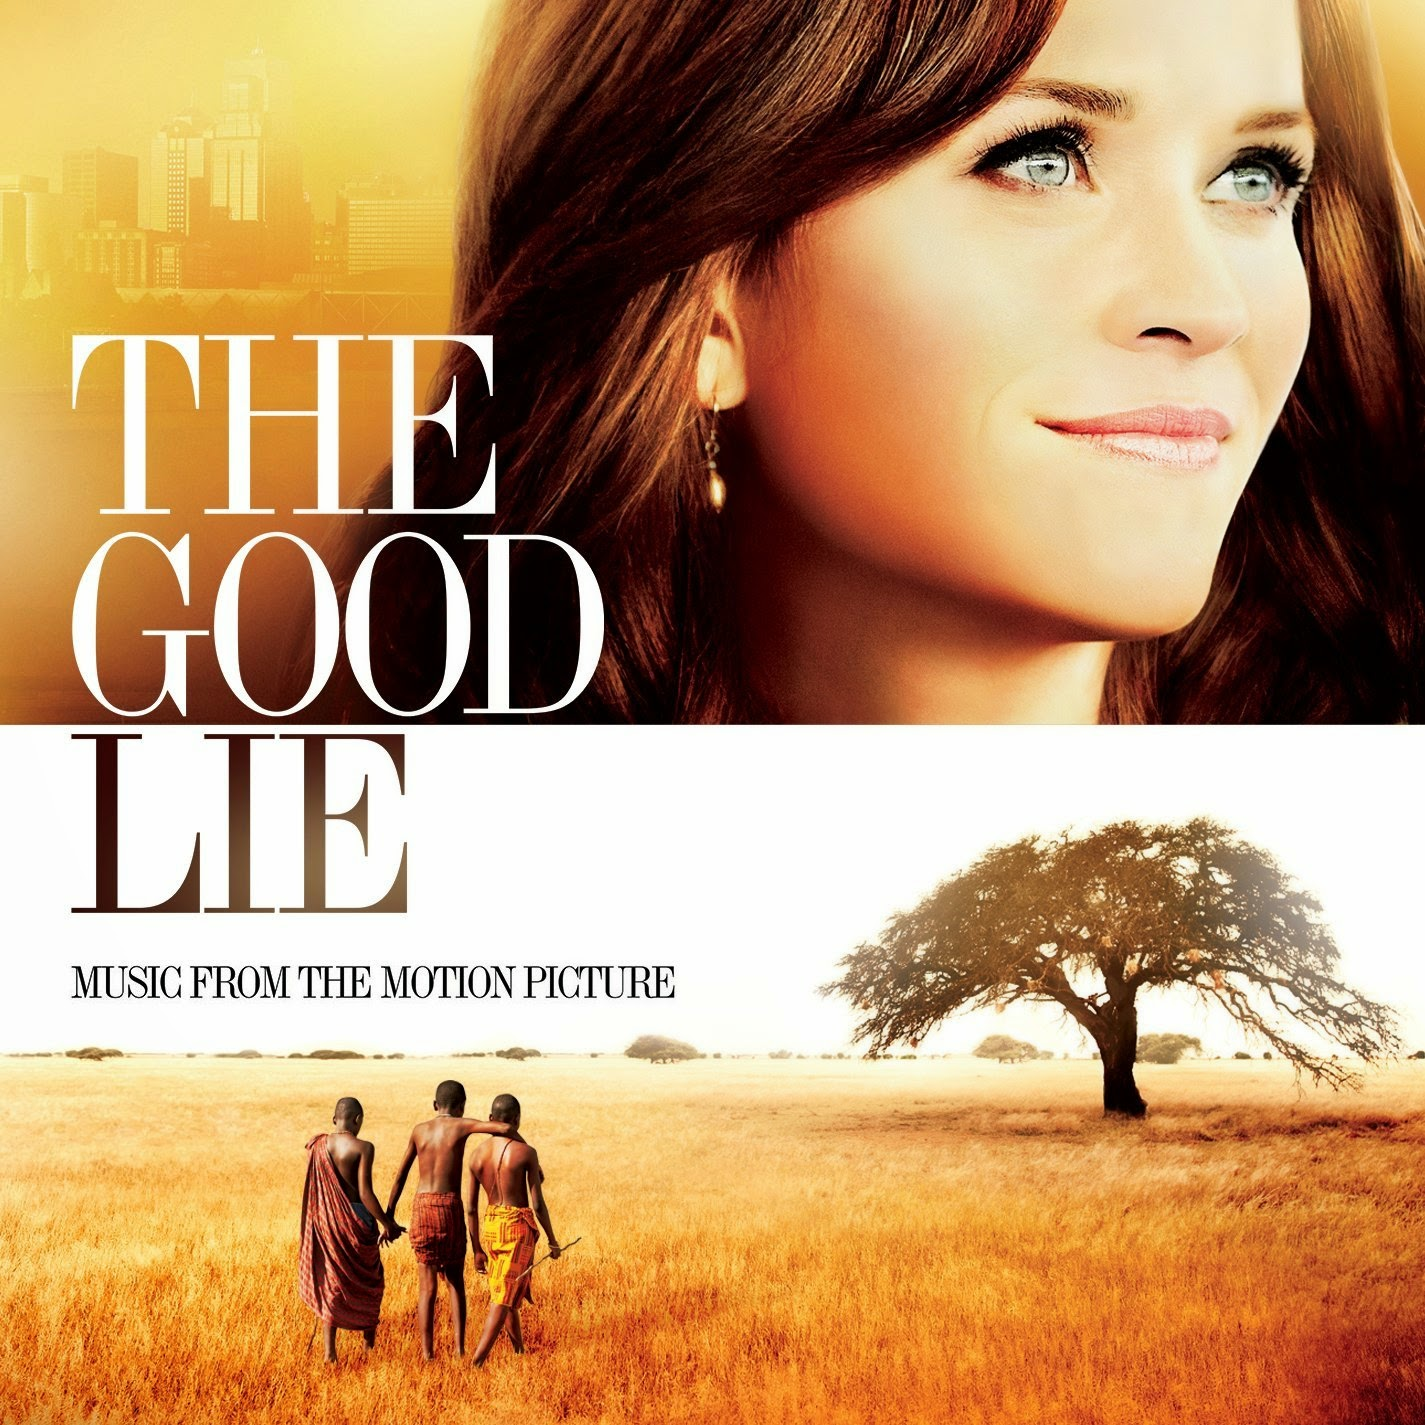 تحميل فيلم The Good Lie 2014 DVD